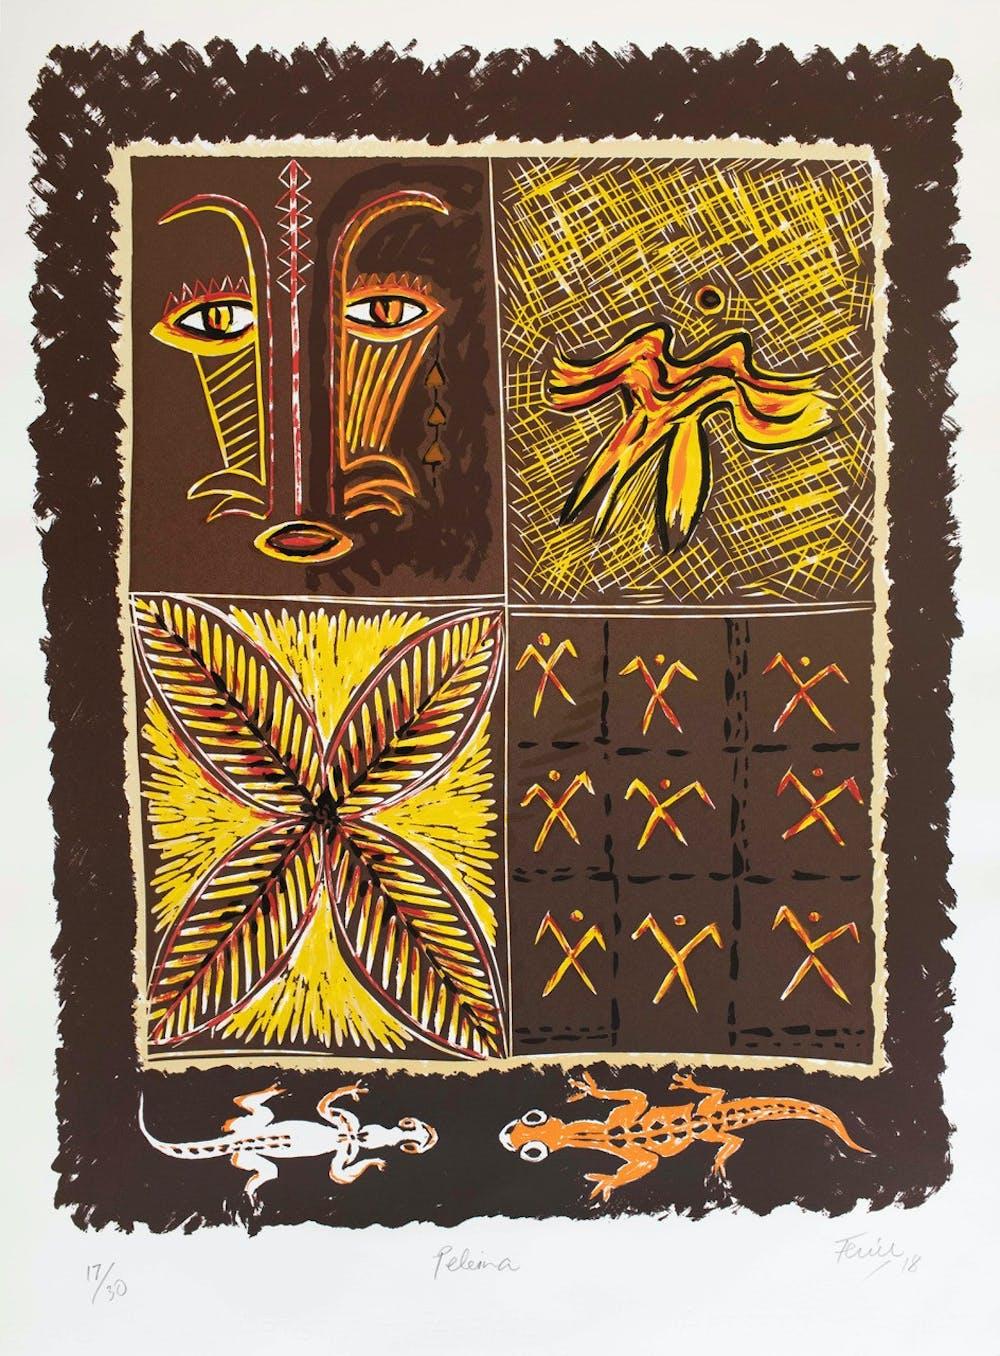 Fatu Feuu Paleina Limi ted ed print on fine art paper 790x555mm Signed titled numbered